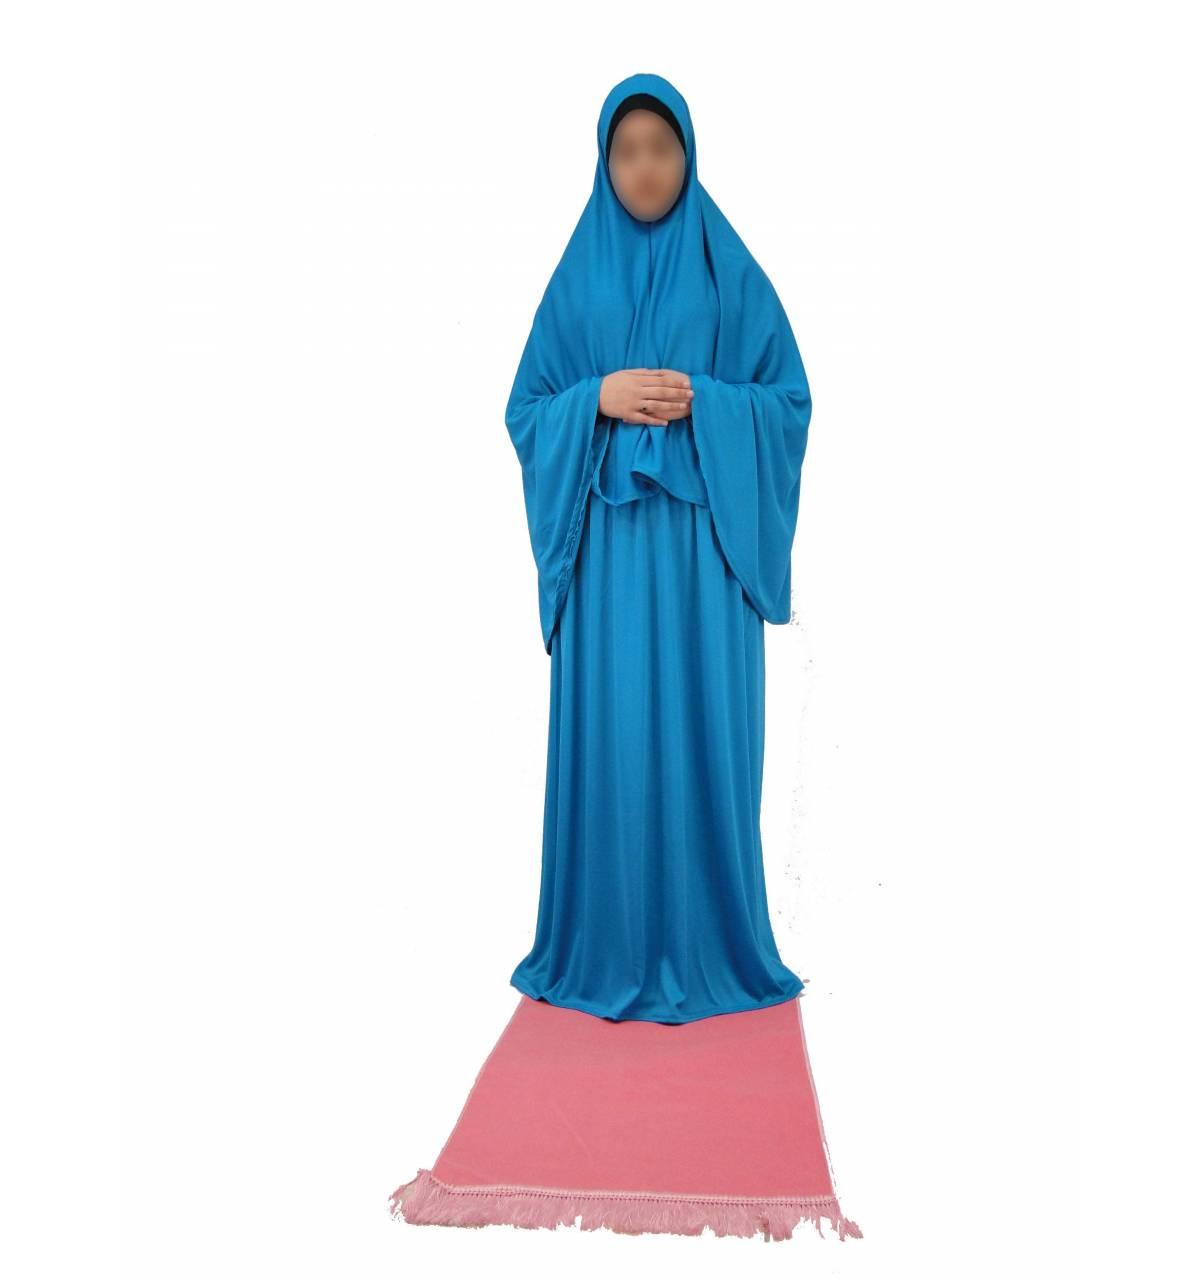 1547cddee8d ENSEMBLE PRIERE - Bismillah Boutique